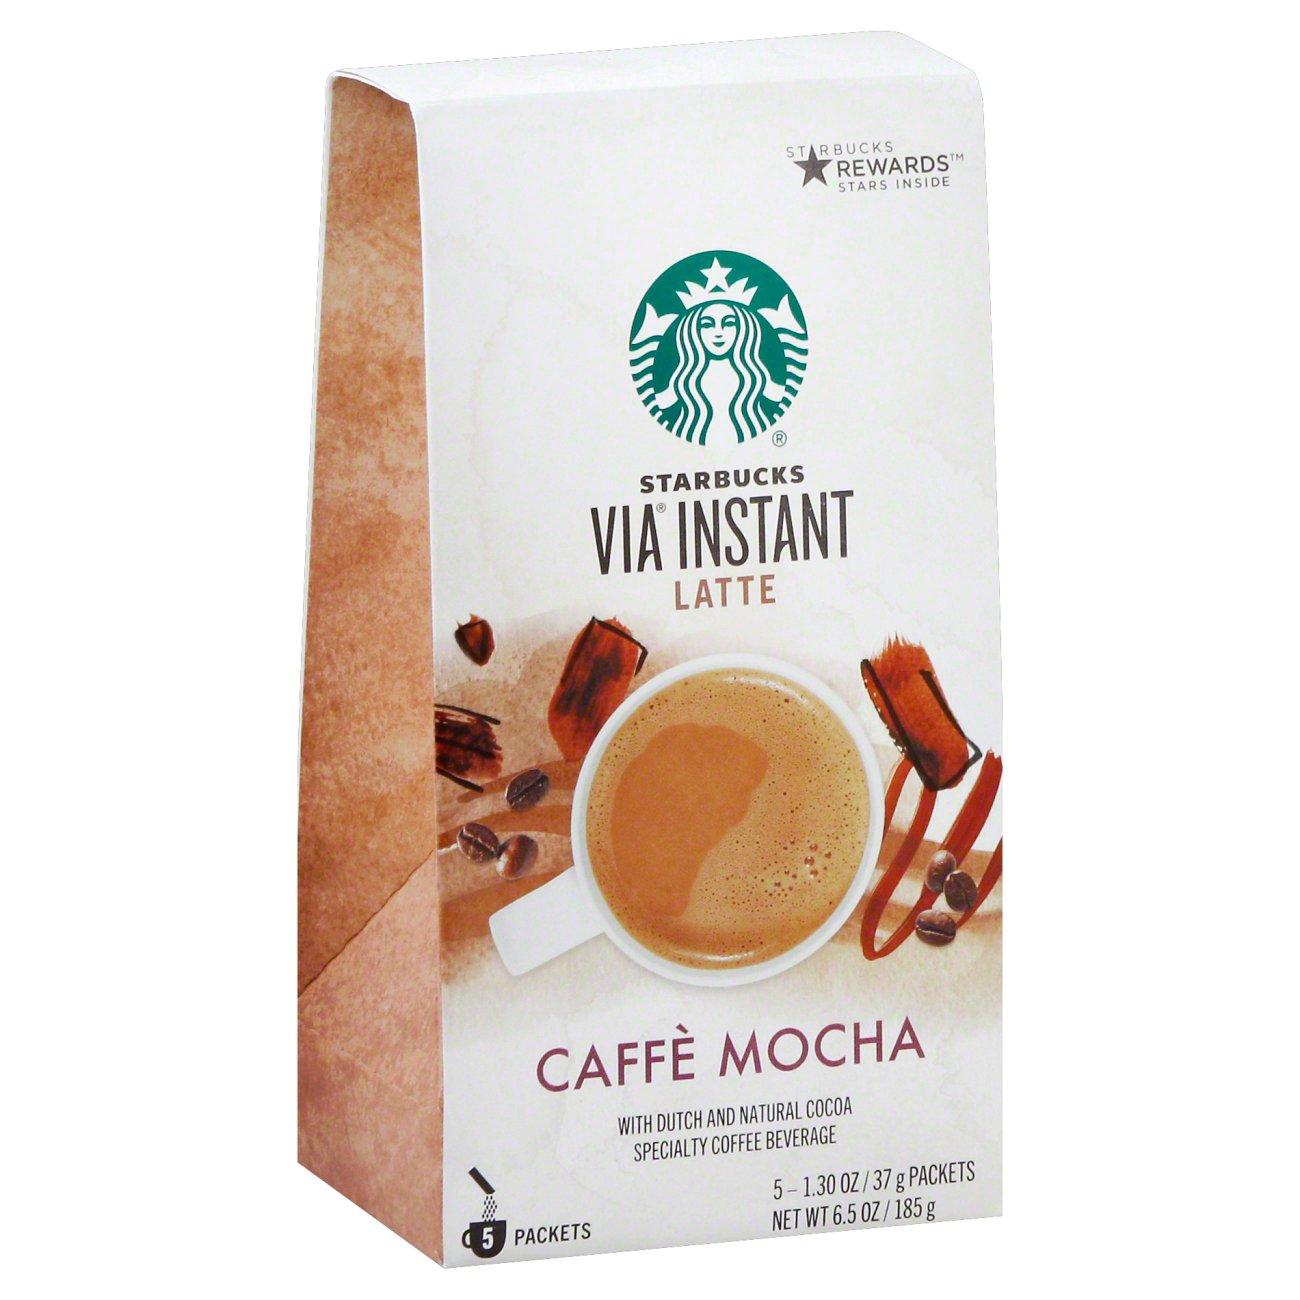 Starbucks Via Latte Caffe Mocha Instant Coffee Packets